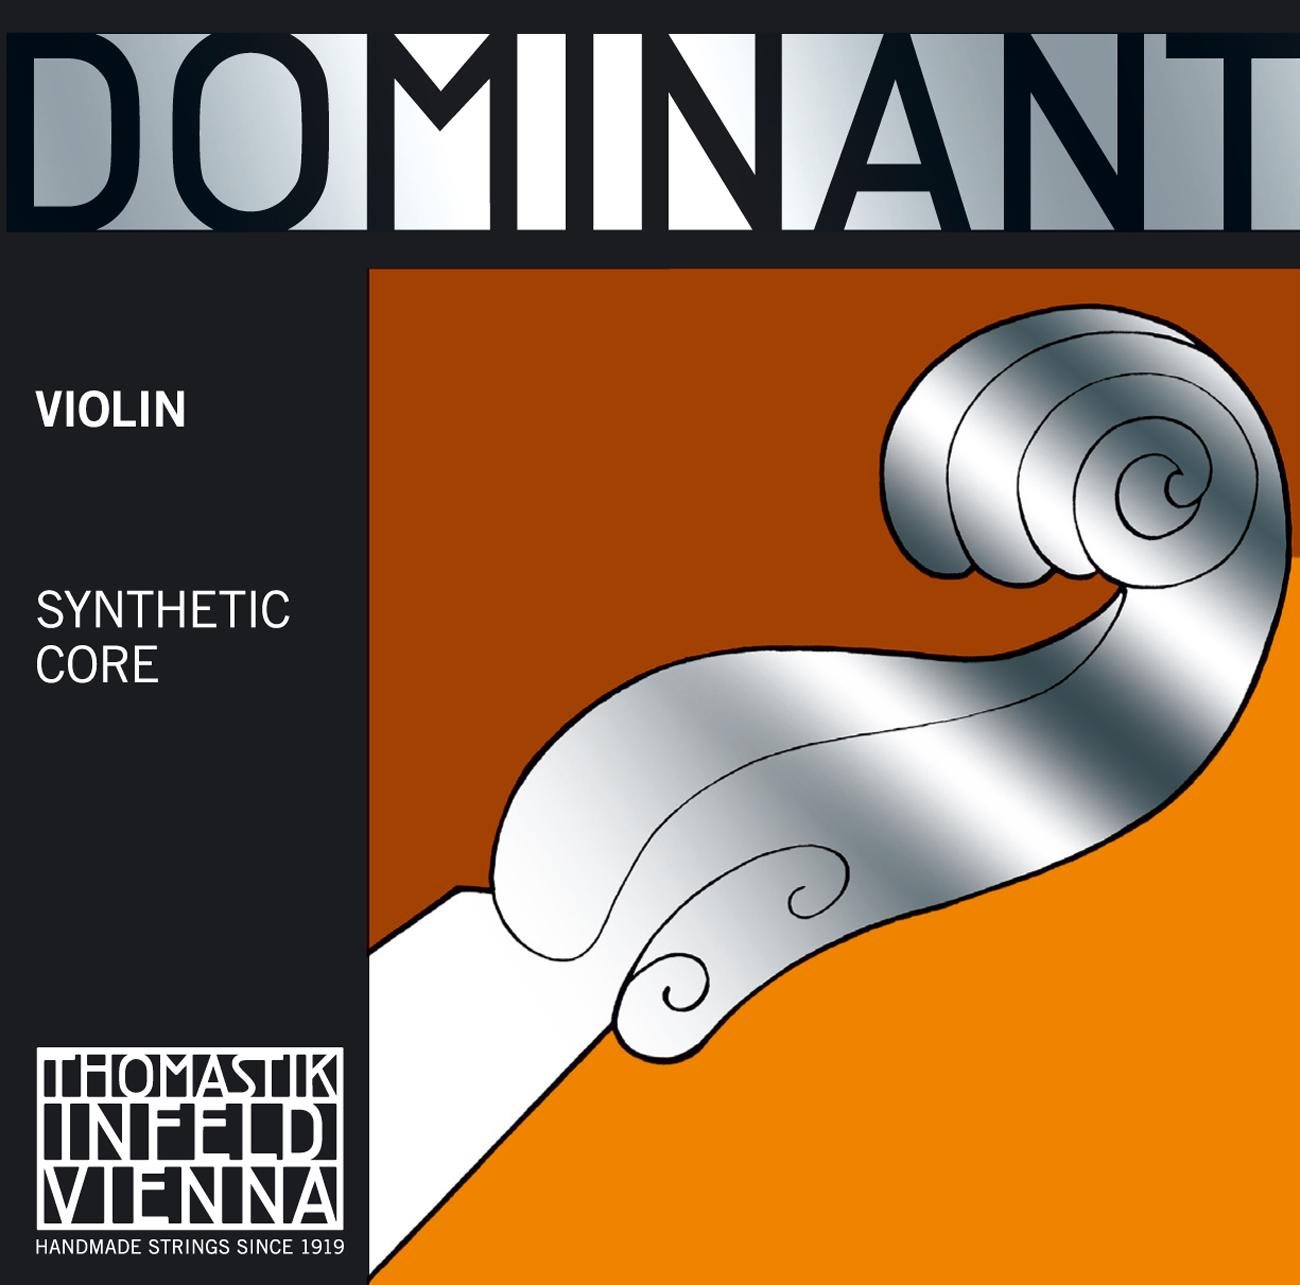 Dominant Violin D Aluminium 4/4 - Strong